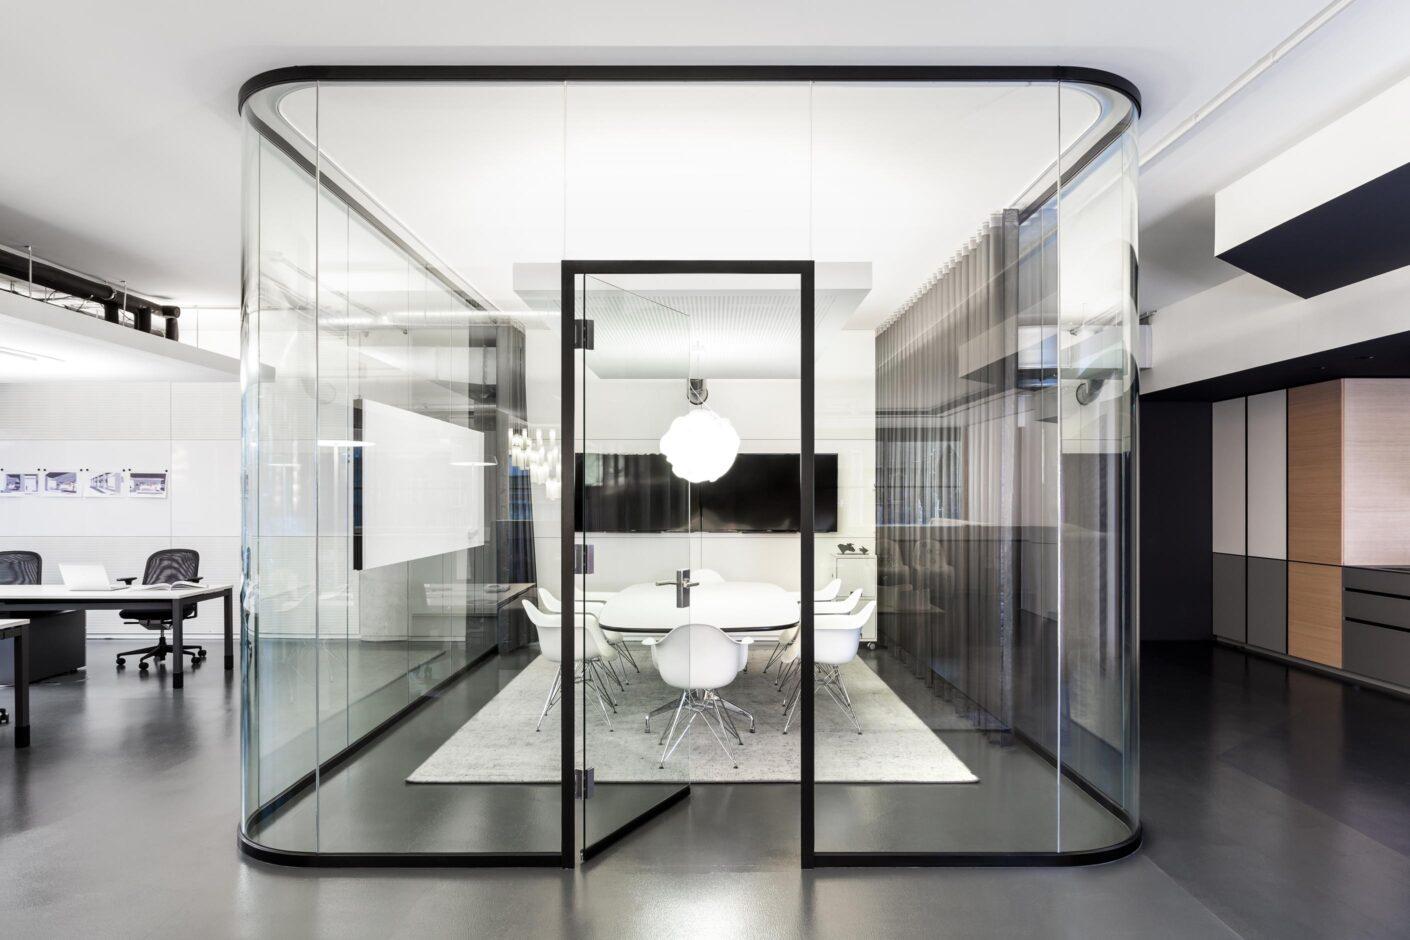 feco-feederle│Trennwandsysteme│Kymo Floorwear Karlsruhe